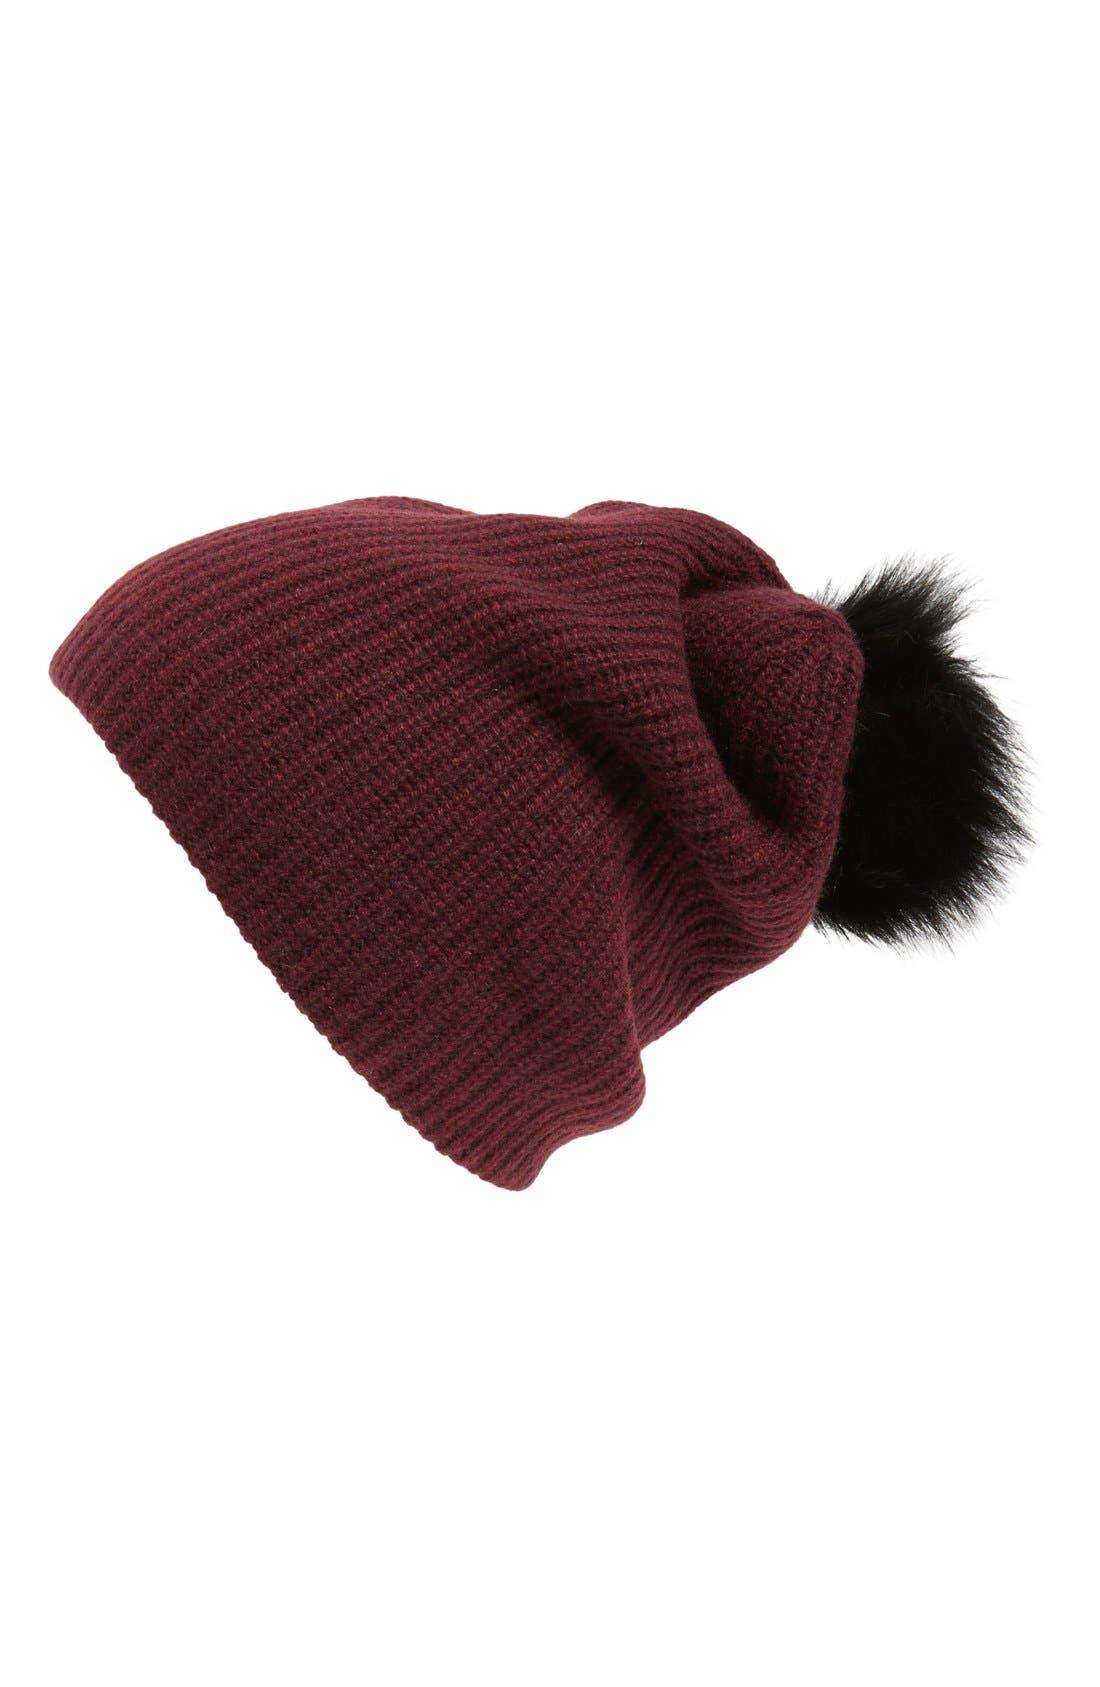 Alternate Image 1 Selected - rag & bone 'Cynthia' Cashmere & Wool Beanie with Genuine Shearling Pompom